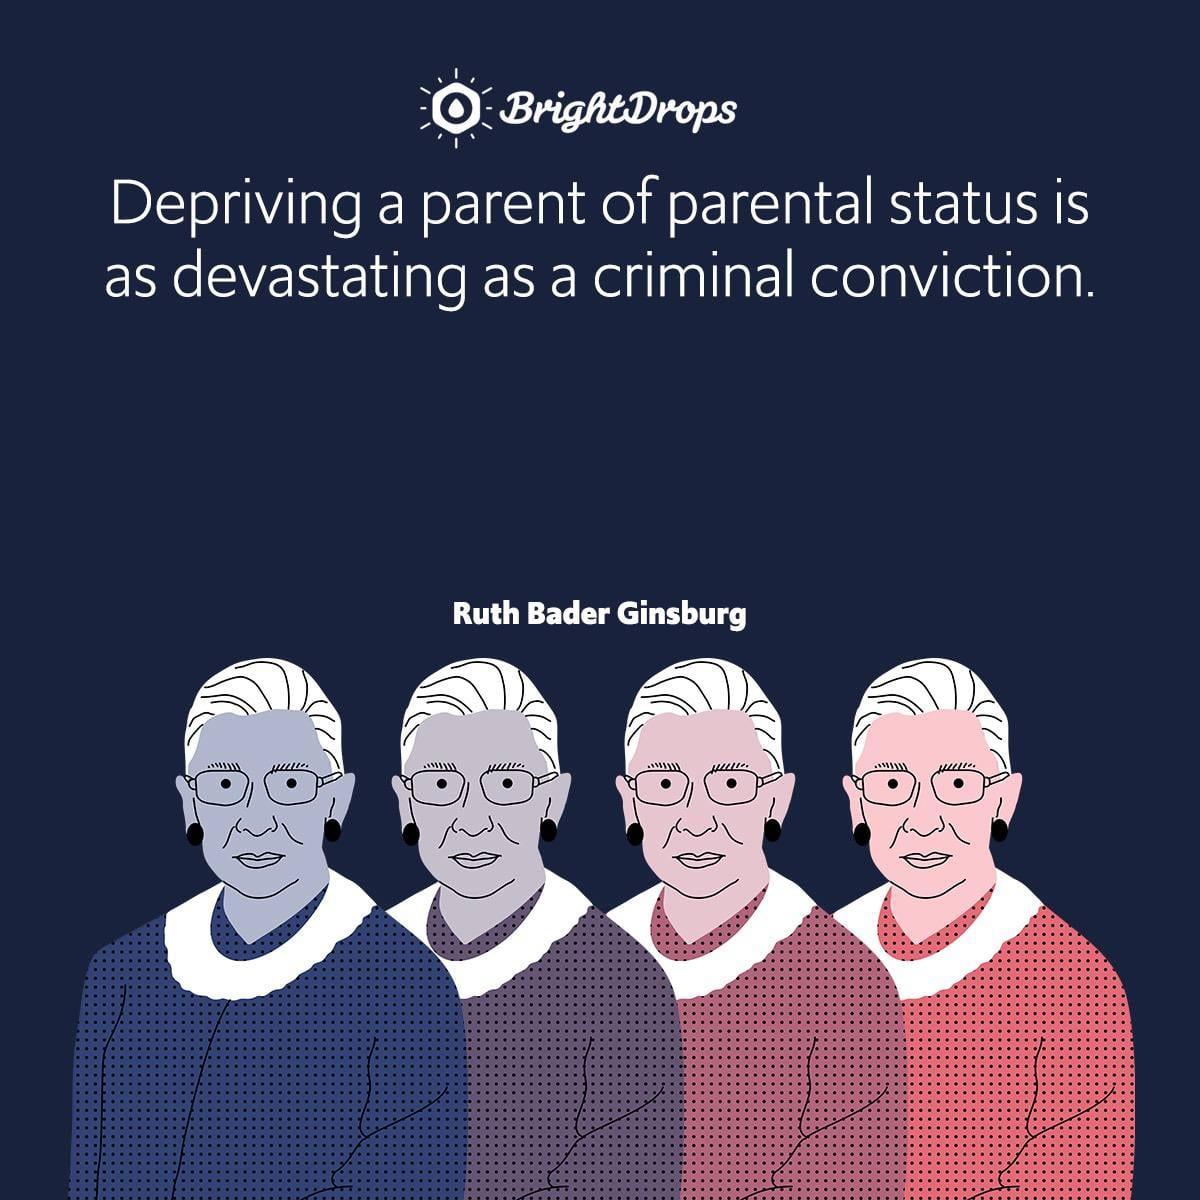 Depriving a parent of parental status is as devastating as a criminal conviction.